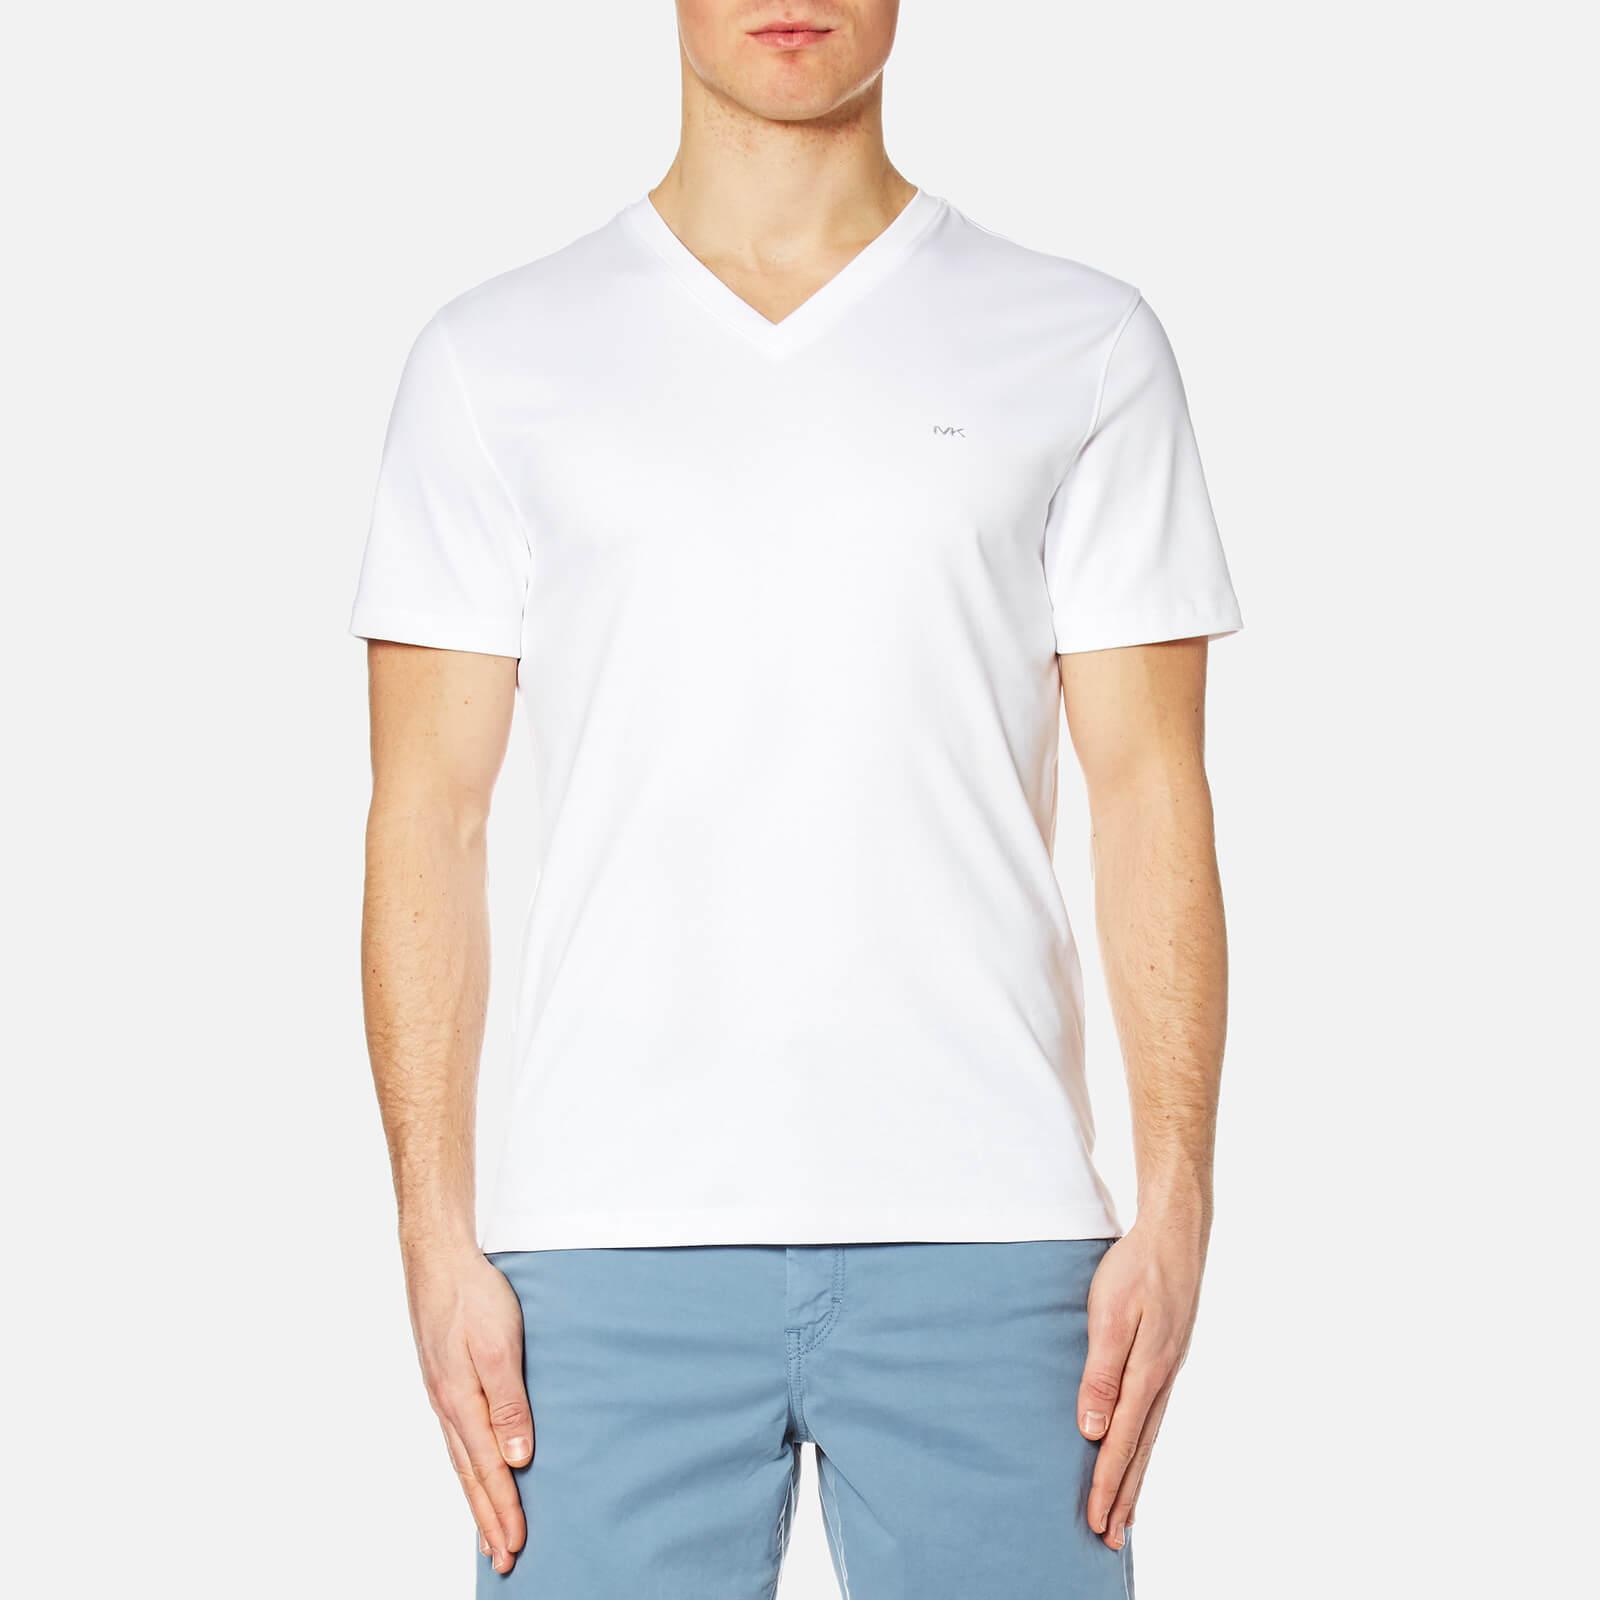 6f0429c9 Michael Kors Men's Sleek Mk V Neck T-Shirt - White Clothing   TheHut.com